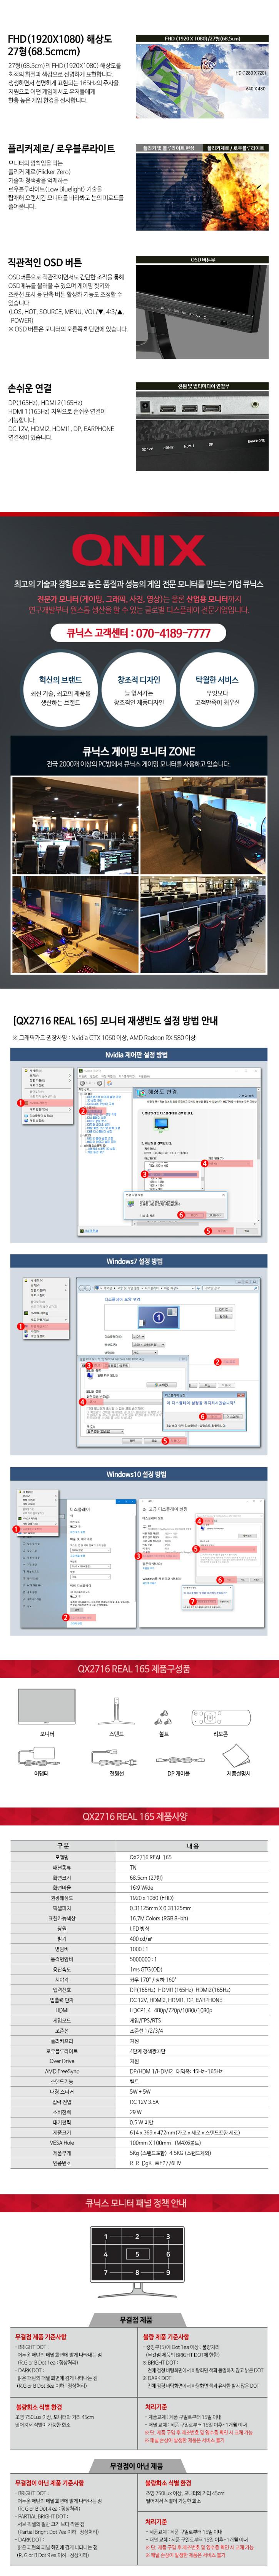 QX2716 REAL 165 (DB)-4.jpg